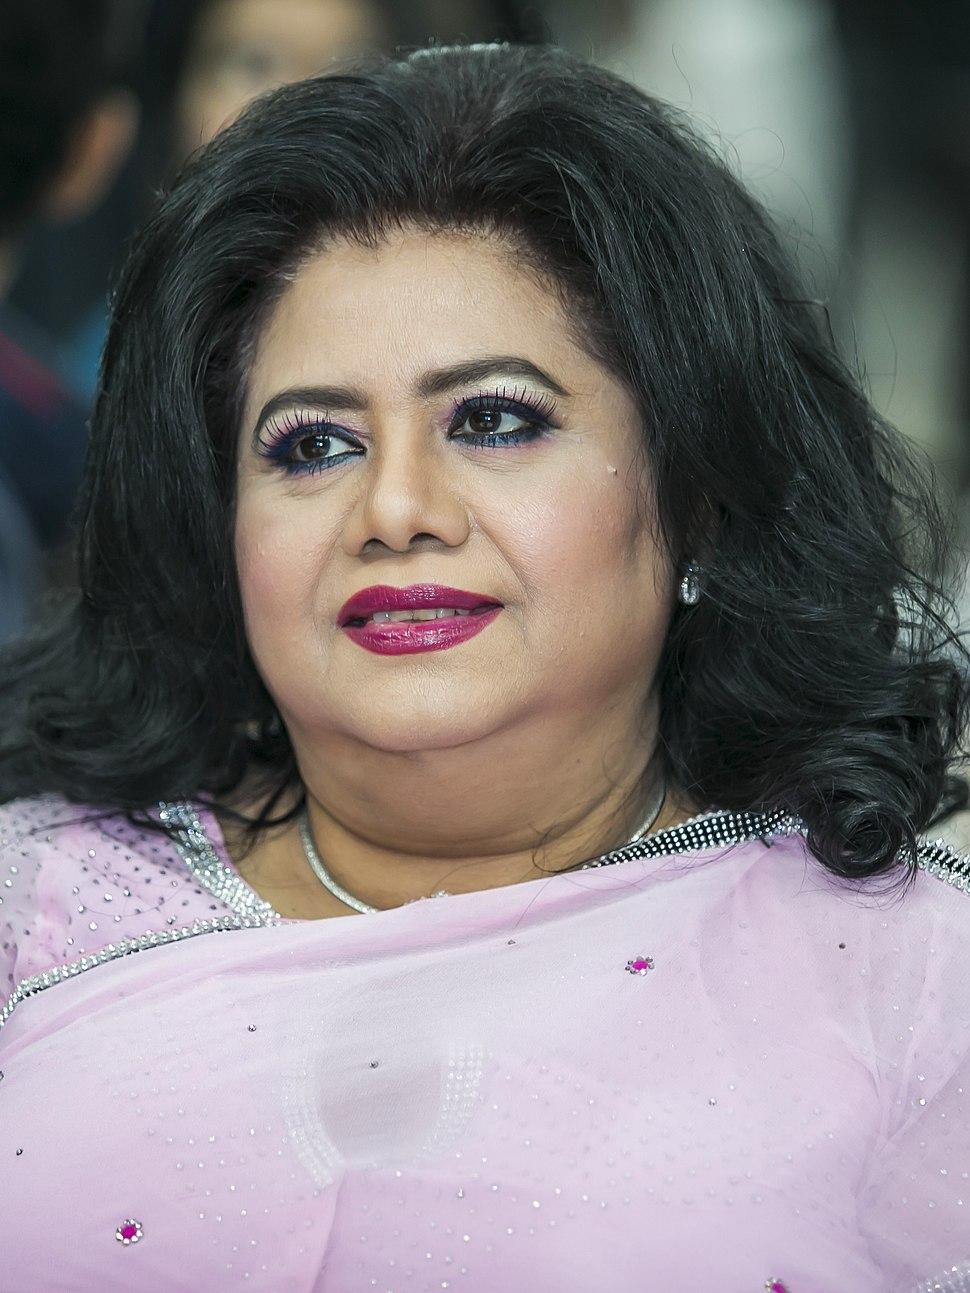 Runa Laila on 4 July 2017 (01) (cropped)